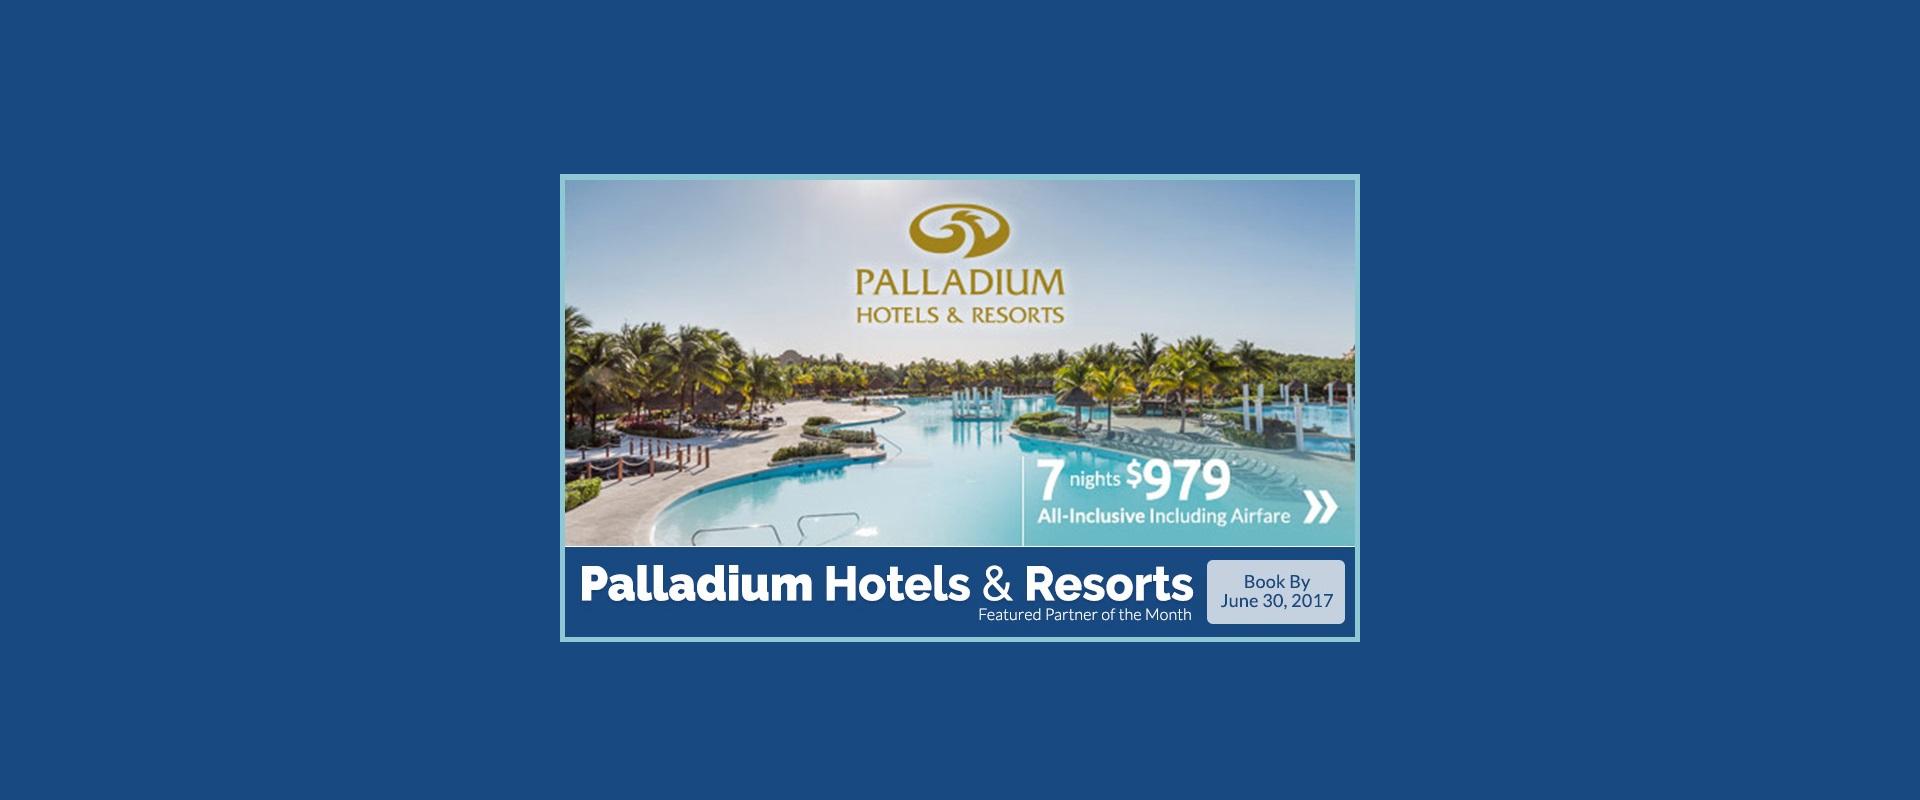 Palladium-Header